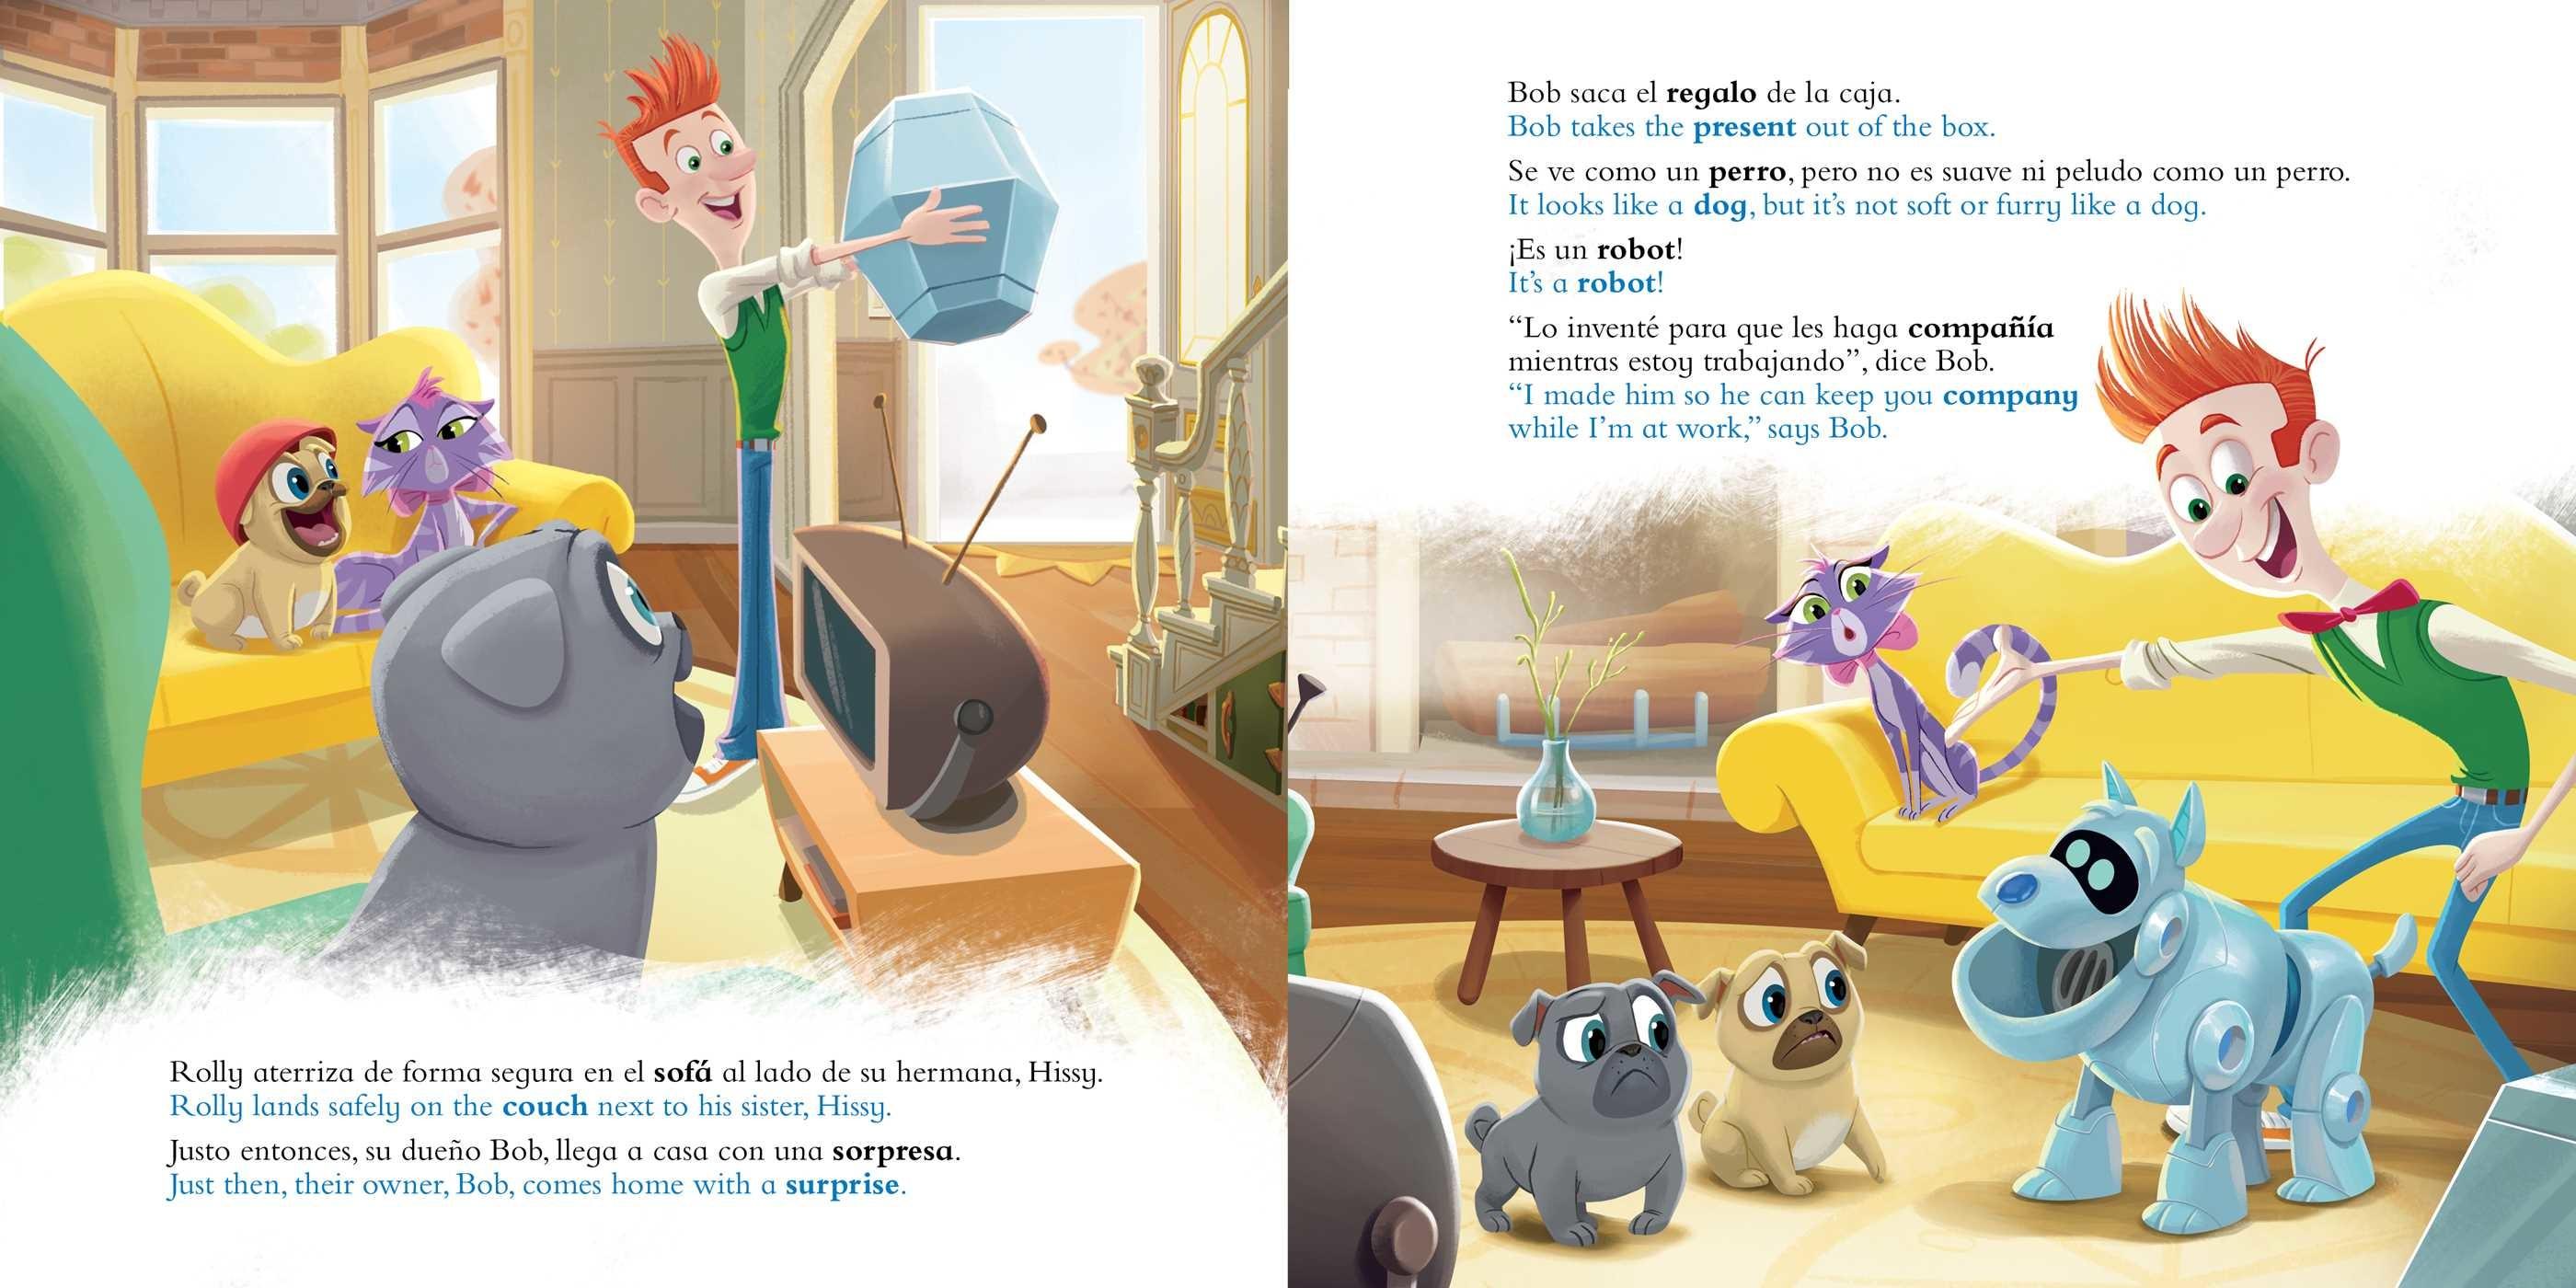 Good clean fun diversion buena y limpia english spanish disney puppy dog pals 9781499807875.in01